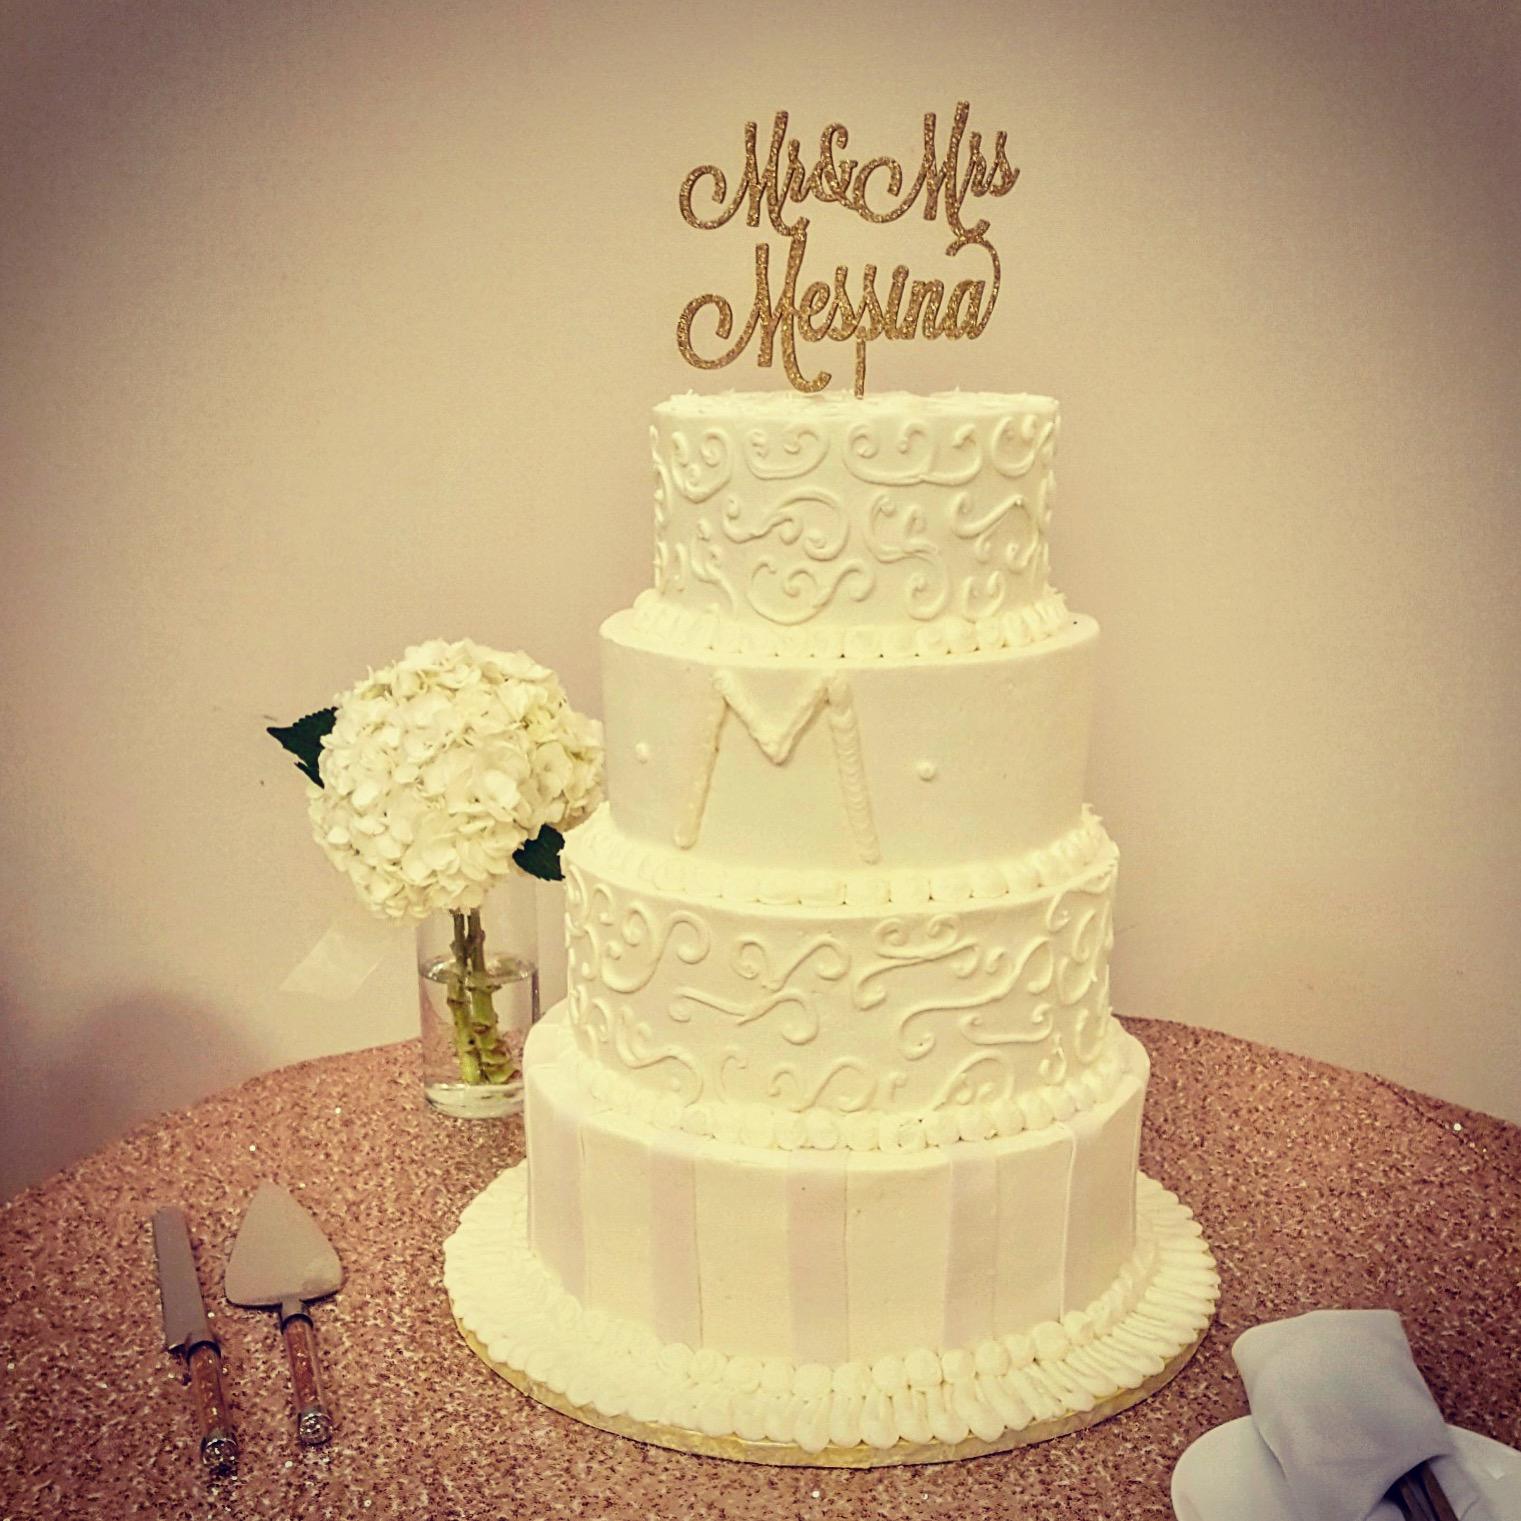 Wedding4tierwhiteScrollandBars.JPG